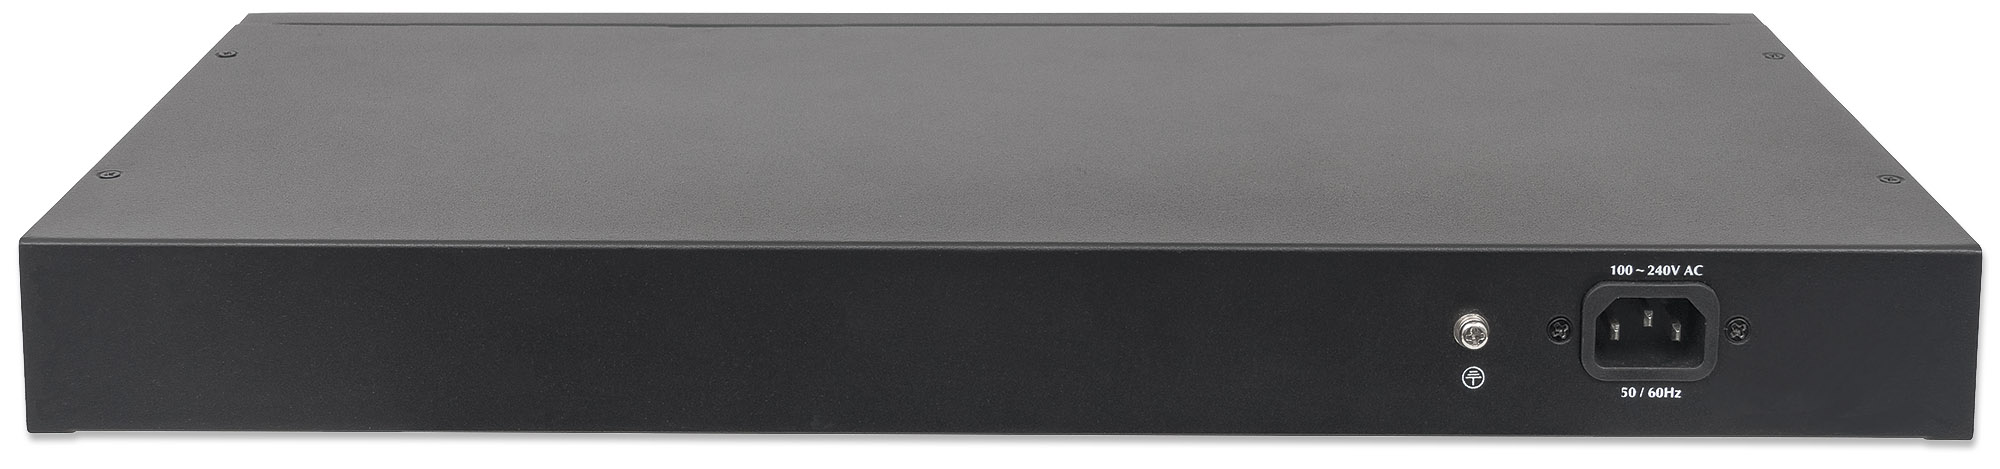 24-Port Gigabit Ethernet PoE+ Web-Managed Switch with 2 SFP Ports